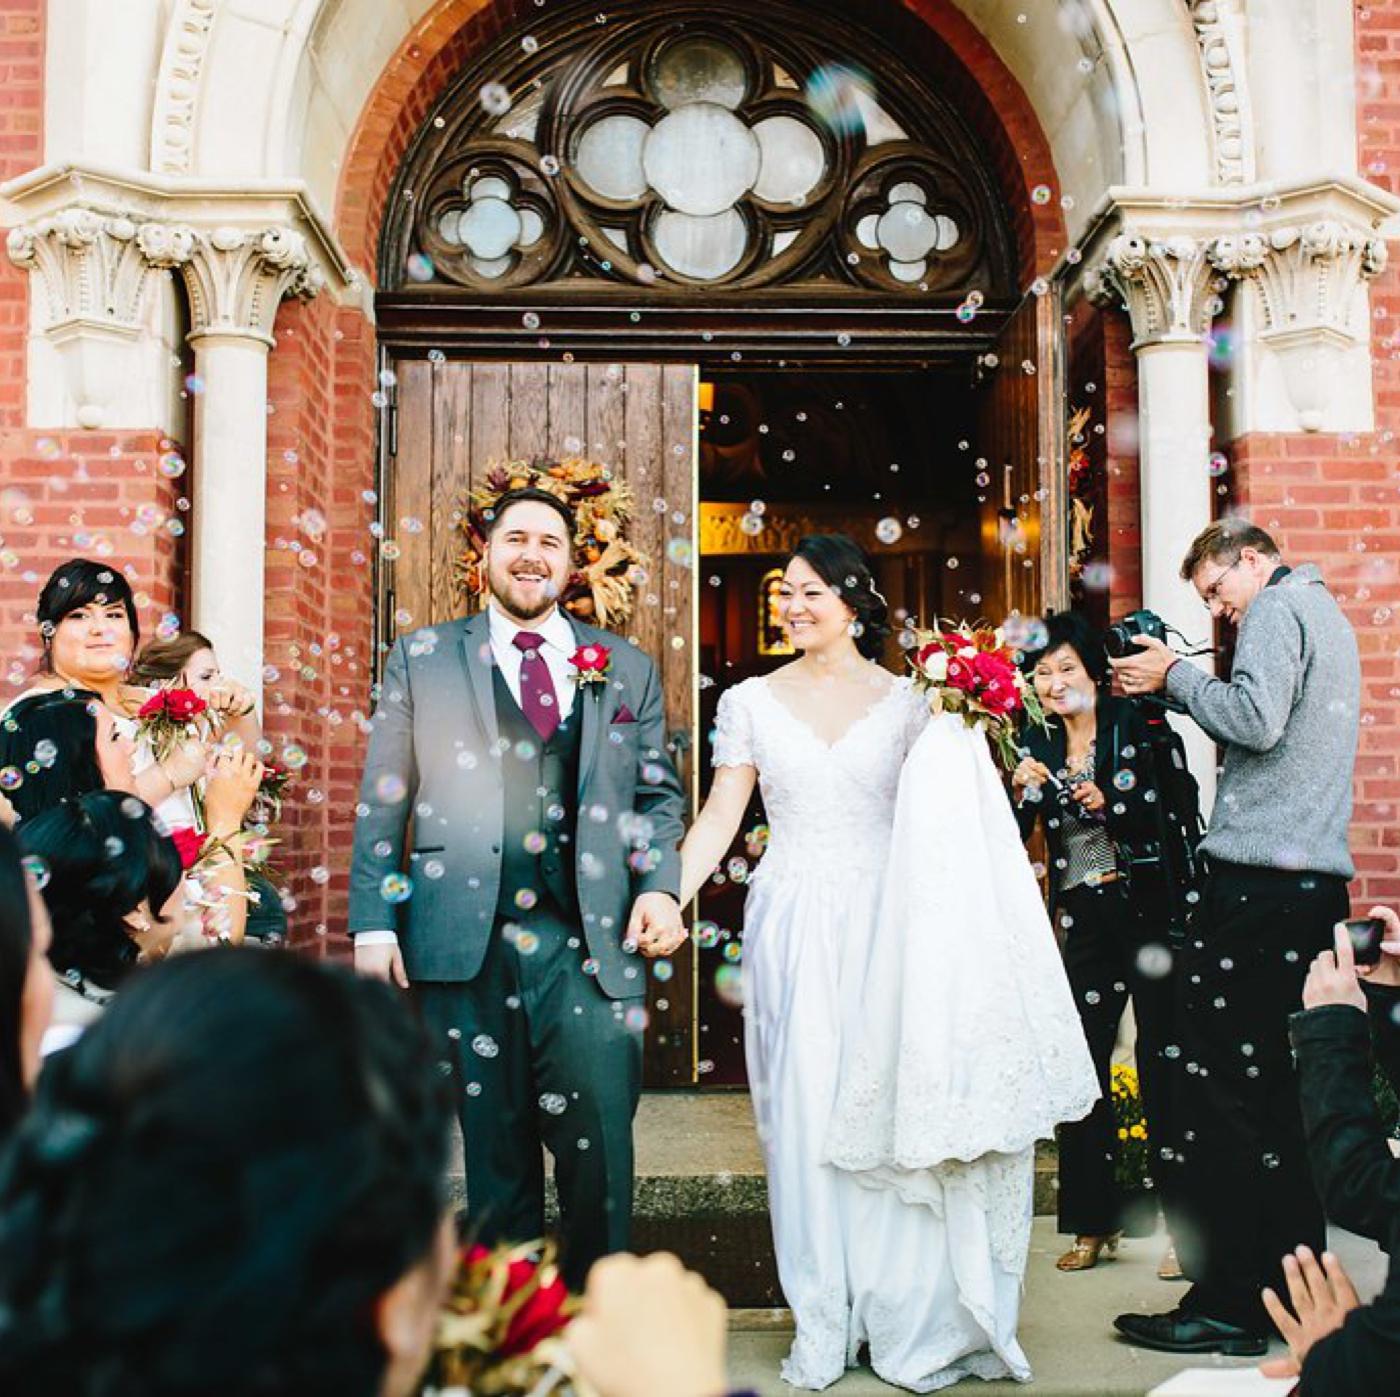 chicago-fine-art-wedding-photography-bolotin27